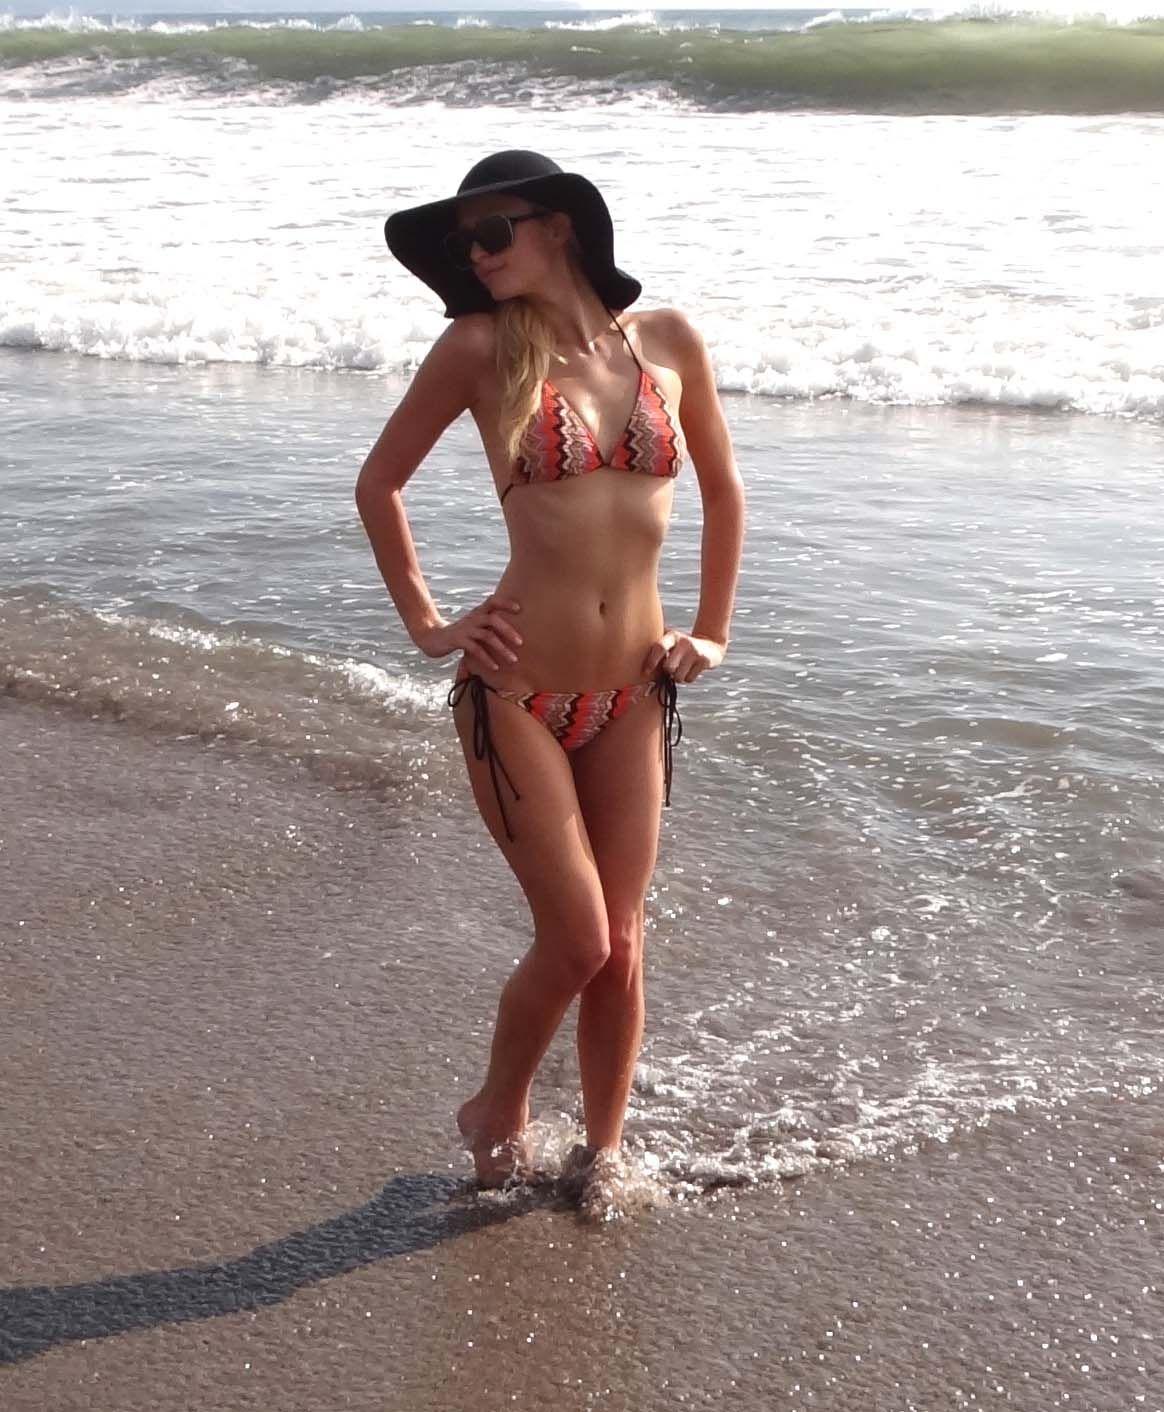 Paris hilton nude on beach